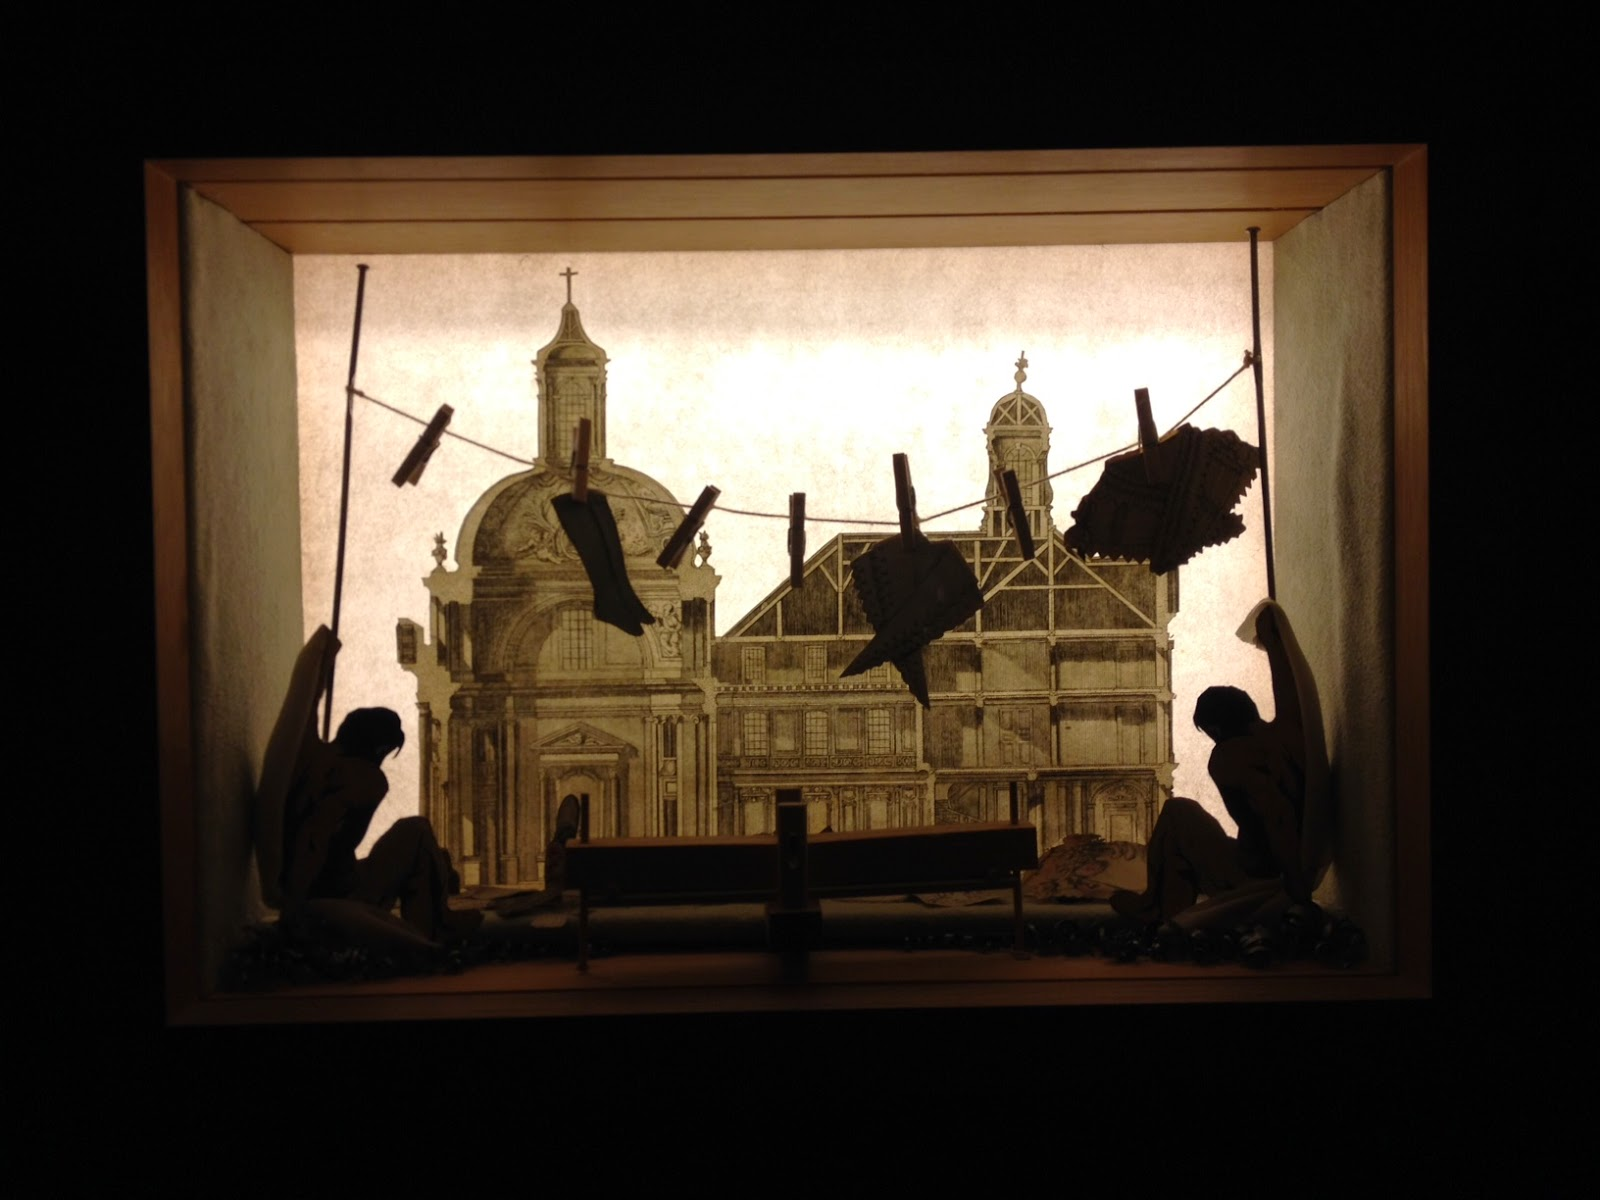 Camere Oscure Cuneo : Evvivanoé esposizioni darte in cherasco cuneo : le suggestive